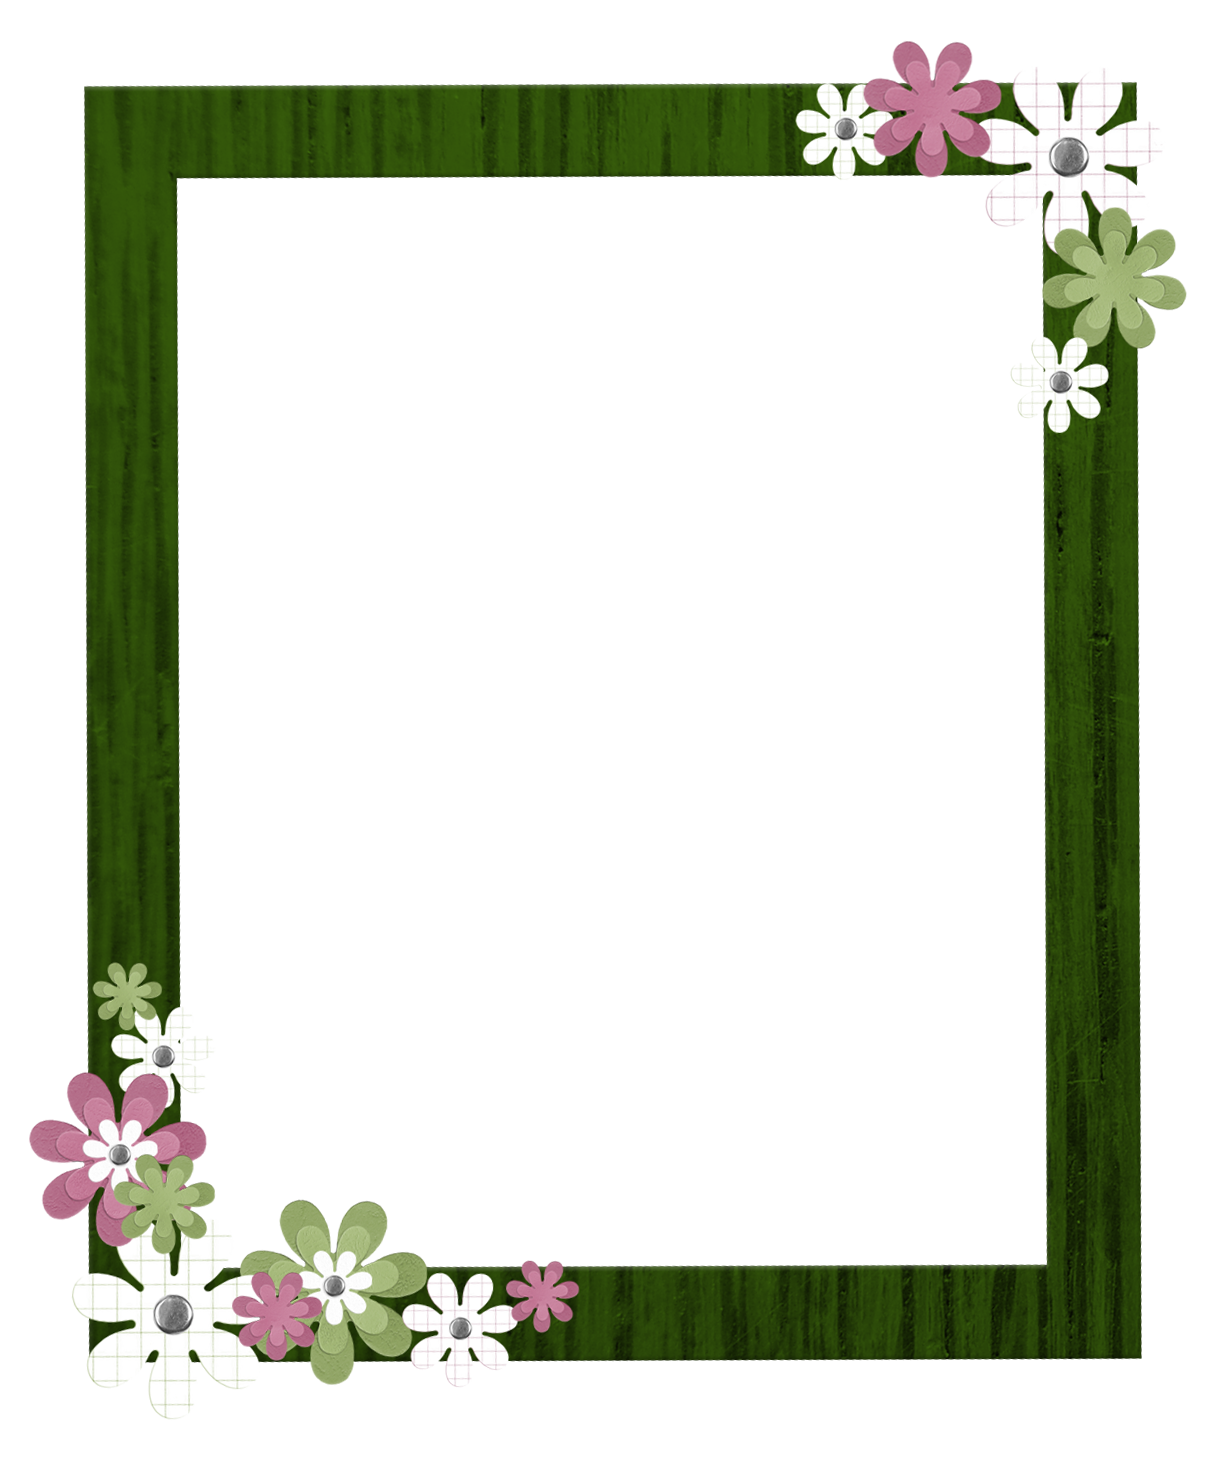 Border png mart. Frame clipart green